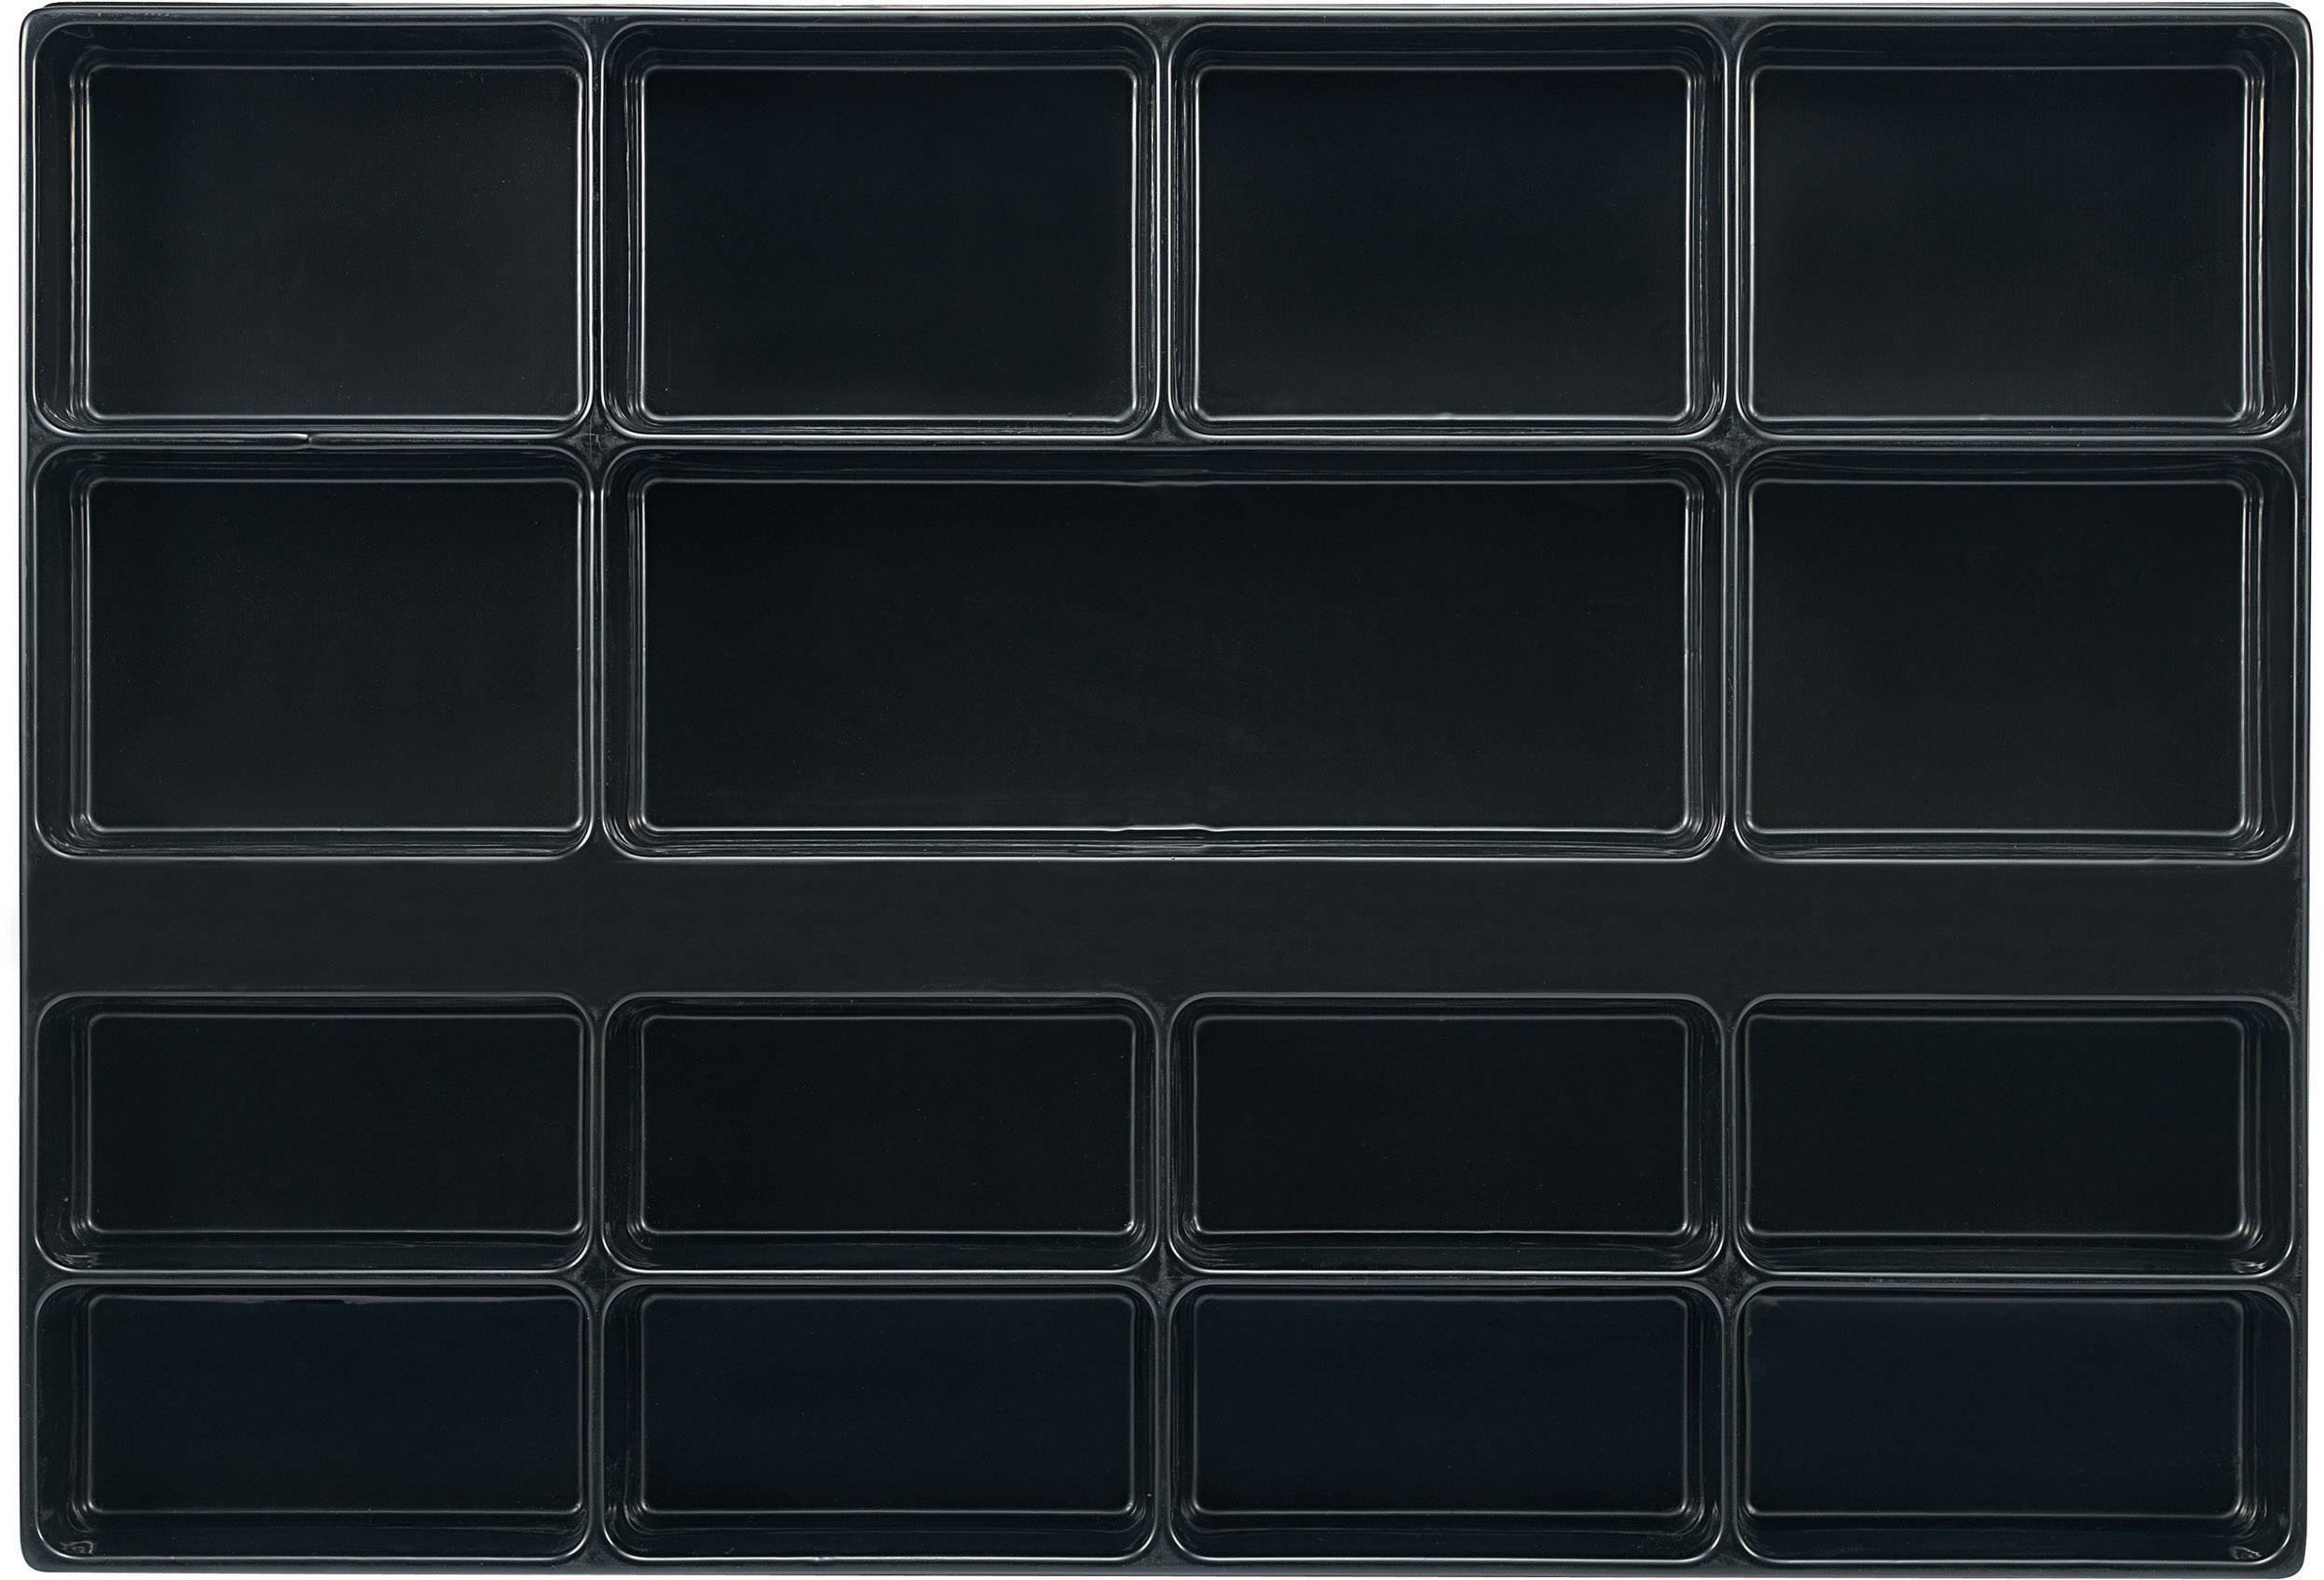 Zásuvky s 15 přihrádkami TOOLCRAFT 96029C700, rozměry:(d x š x v) 570 x 392 x 50 mm